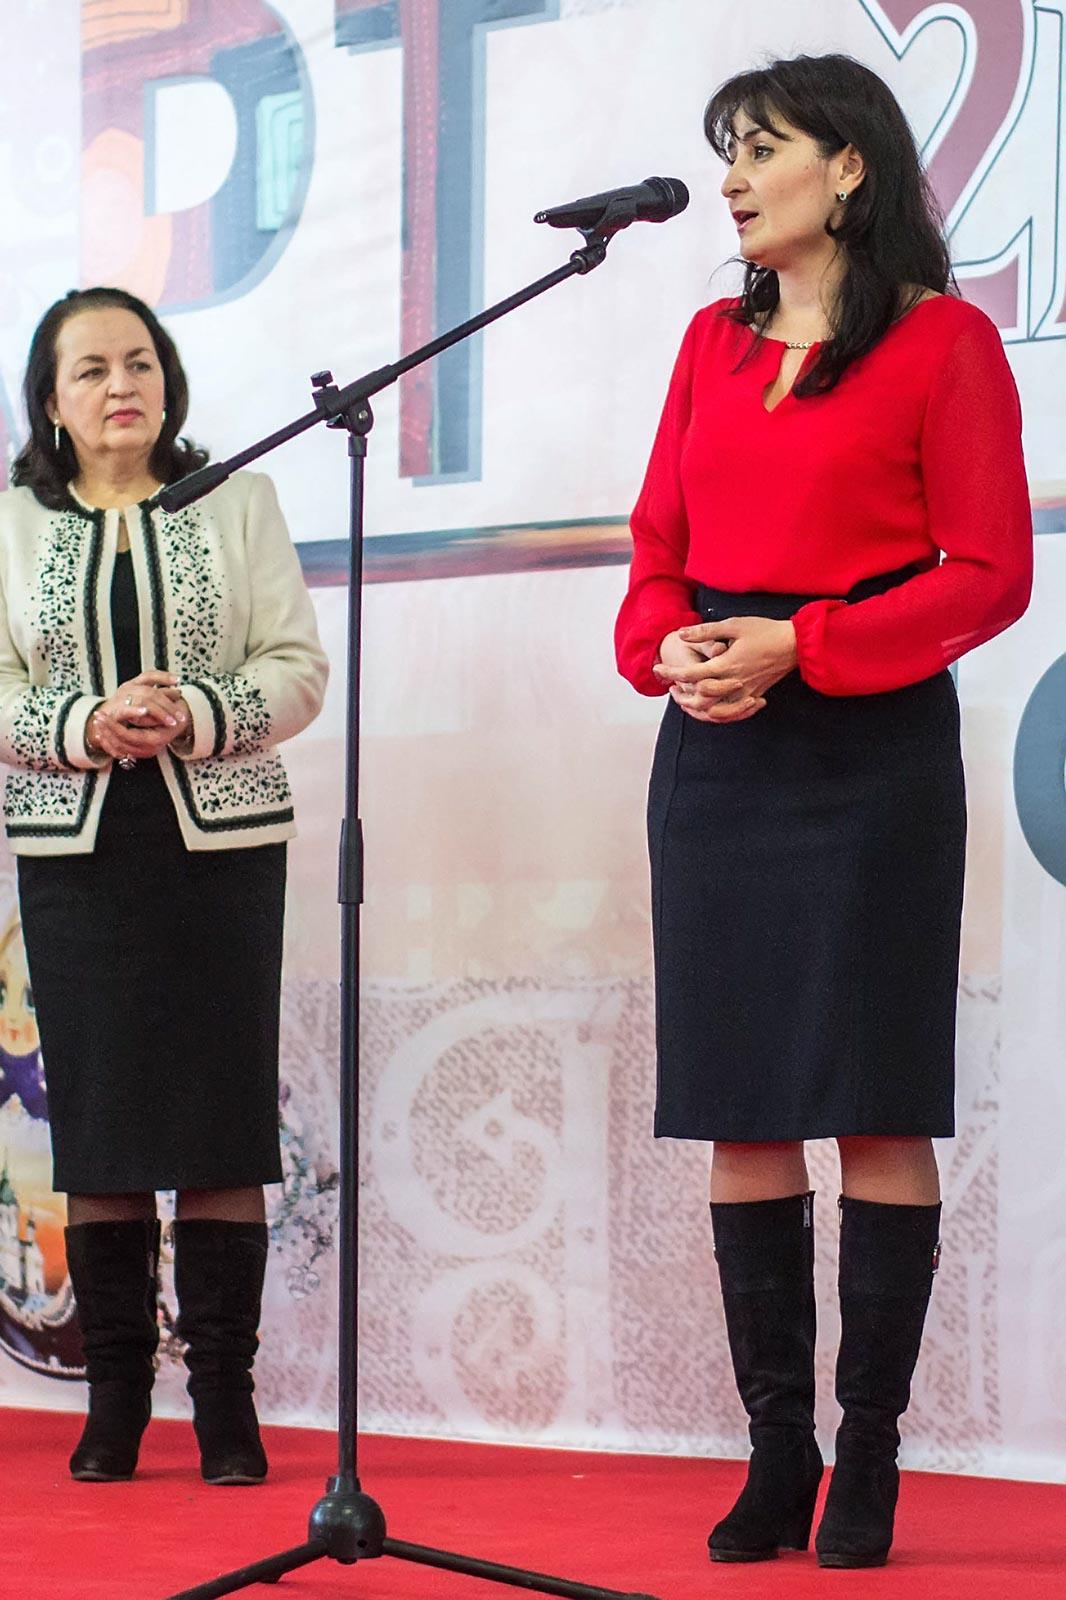 Фото №139941. Церемония открытия «Арт-галерея. Казань — 2013»